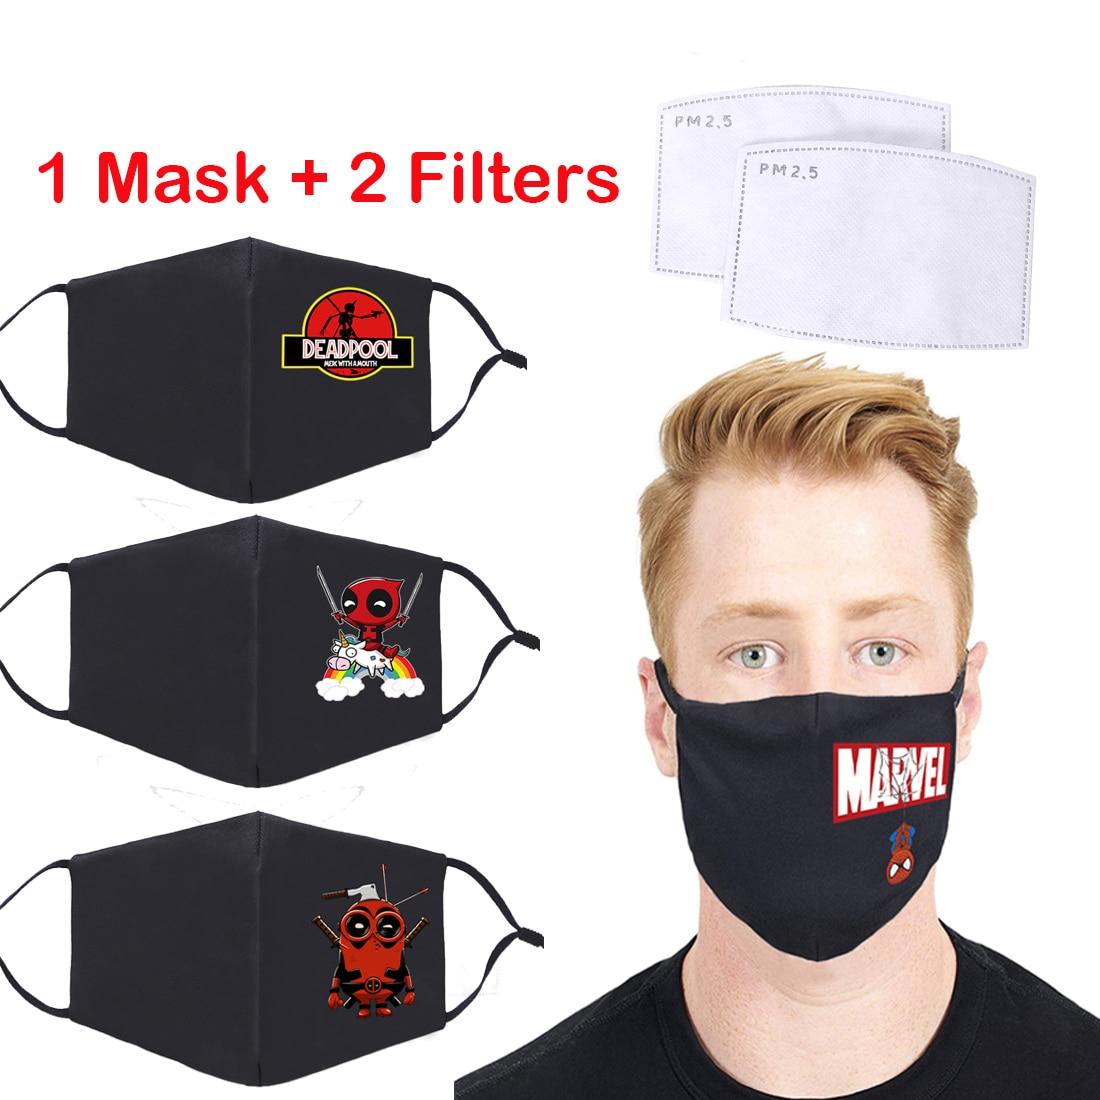 Marvel Deadpool Print Hip Hop Masks PM2.5 Activated Carbon Filter Paper Protective Mouth Muffles Washable Reusable Soft Mask